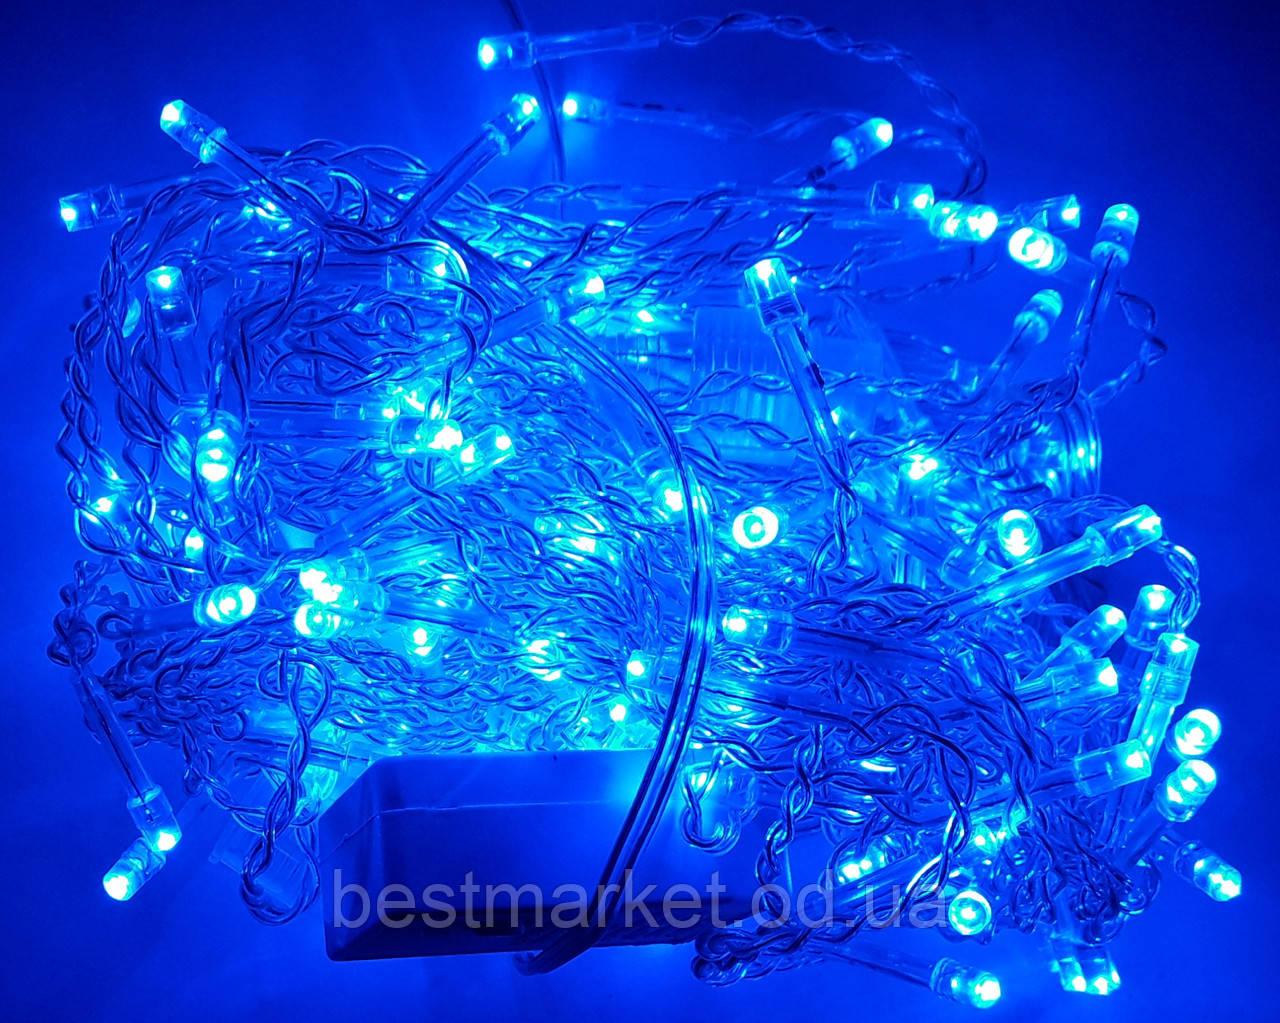 Светодиодная Гирлянда Штора 140 Led 3 х 0,7 м Синяя В без Режимов